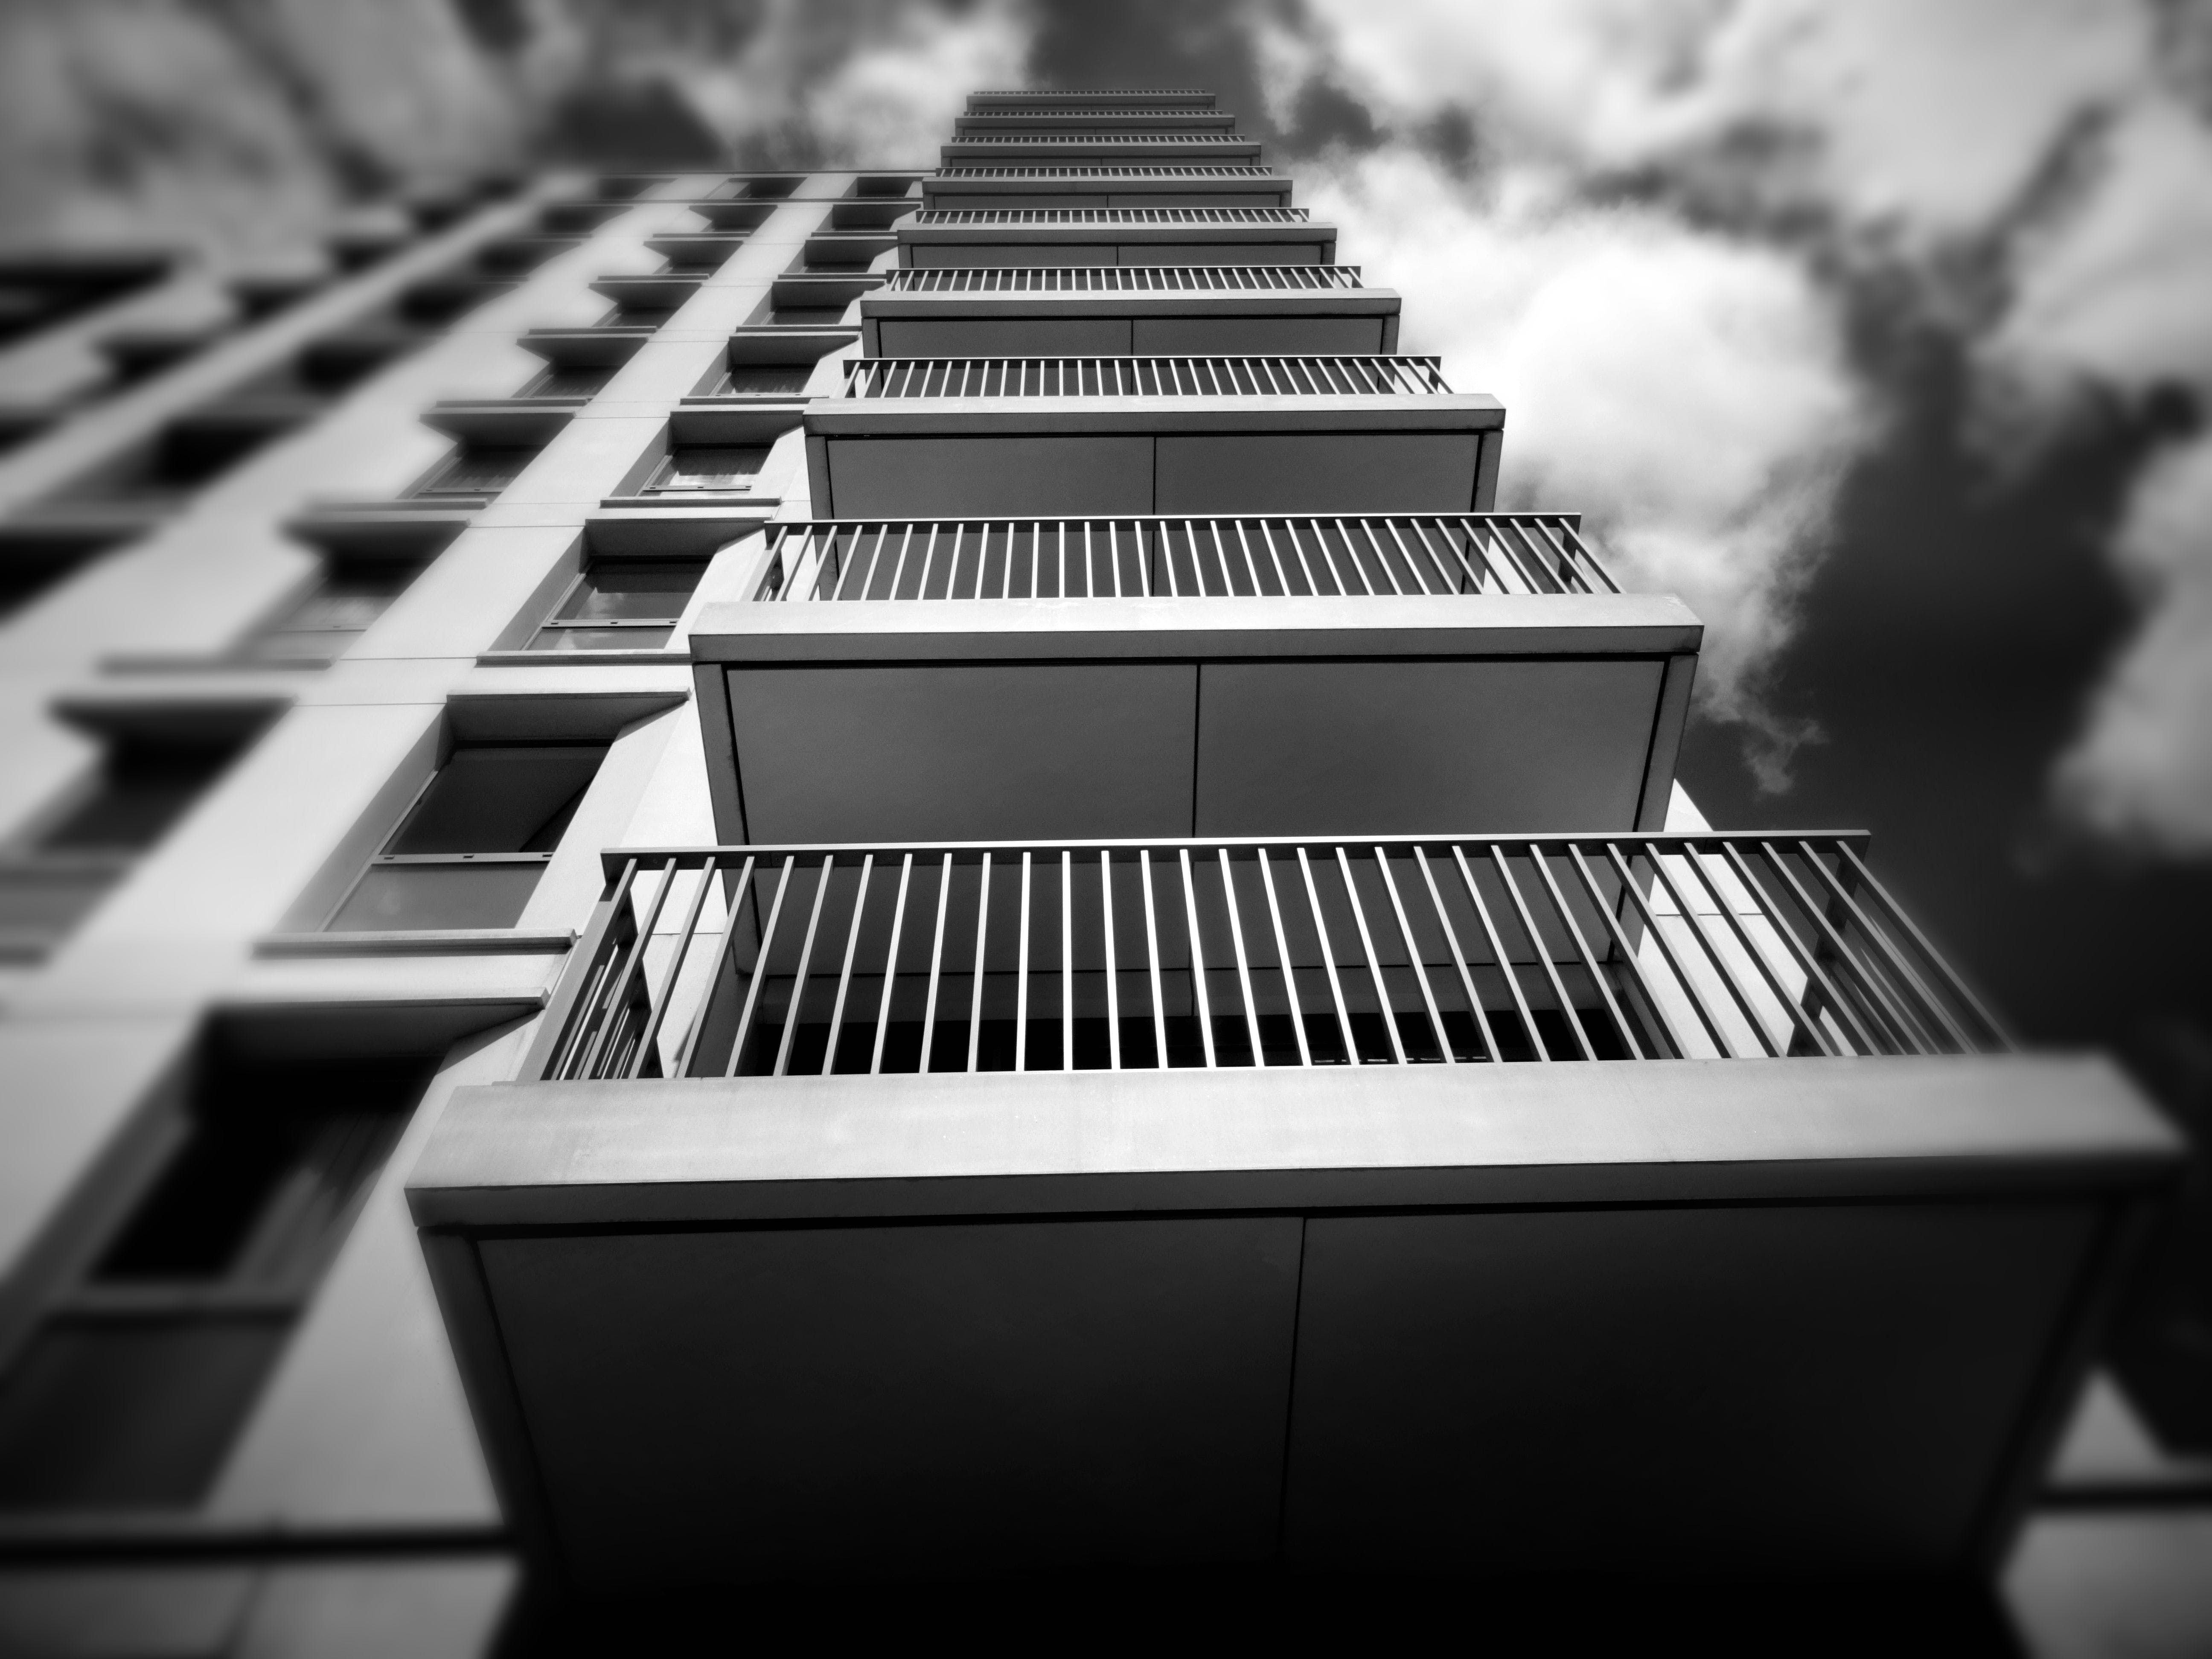 Building Balcony from Bottom